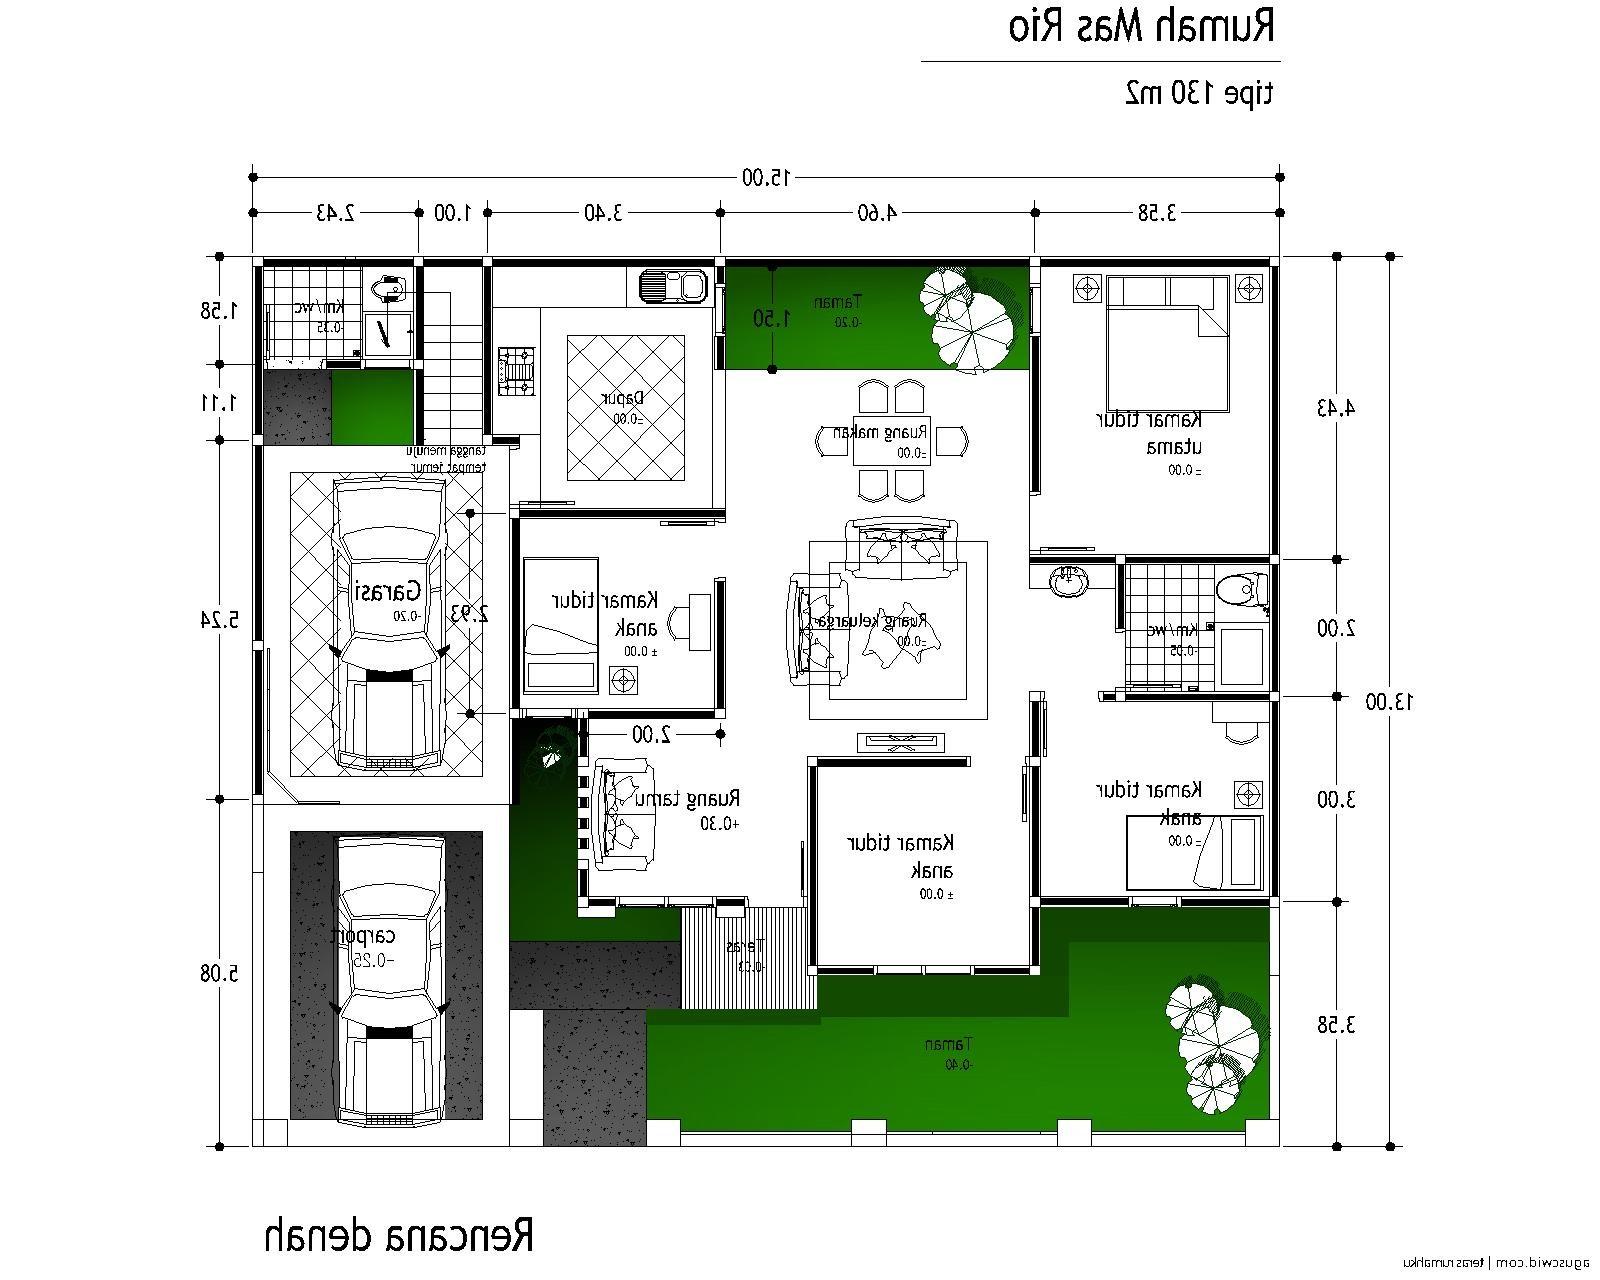 Rumah Minimalis Beserta Denahnya Terbaru Denah Rumah 4 Kamar 1